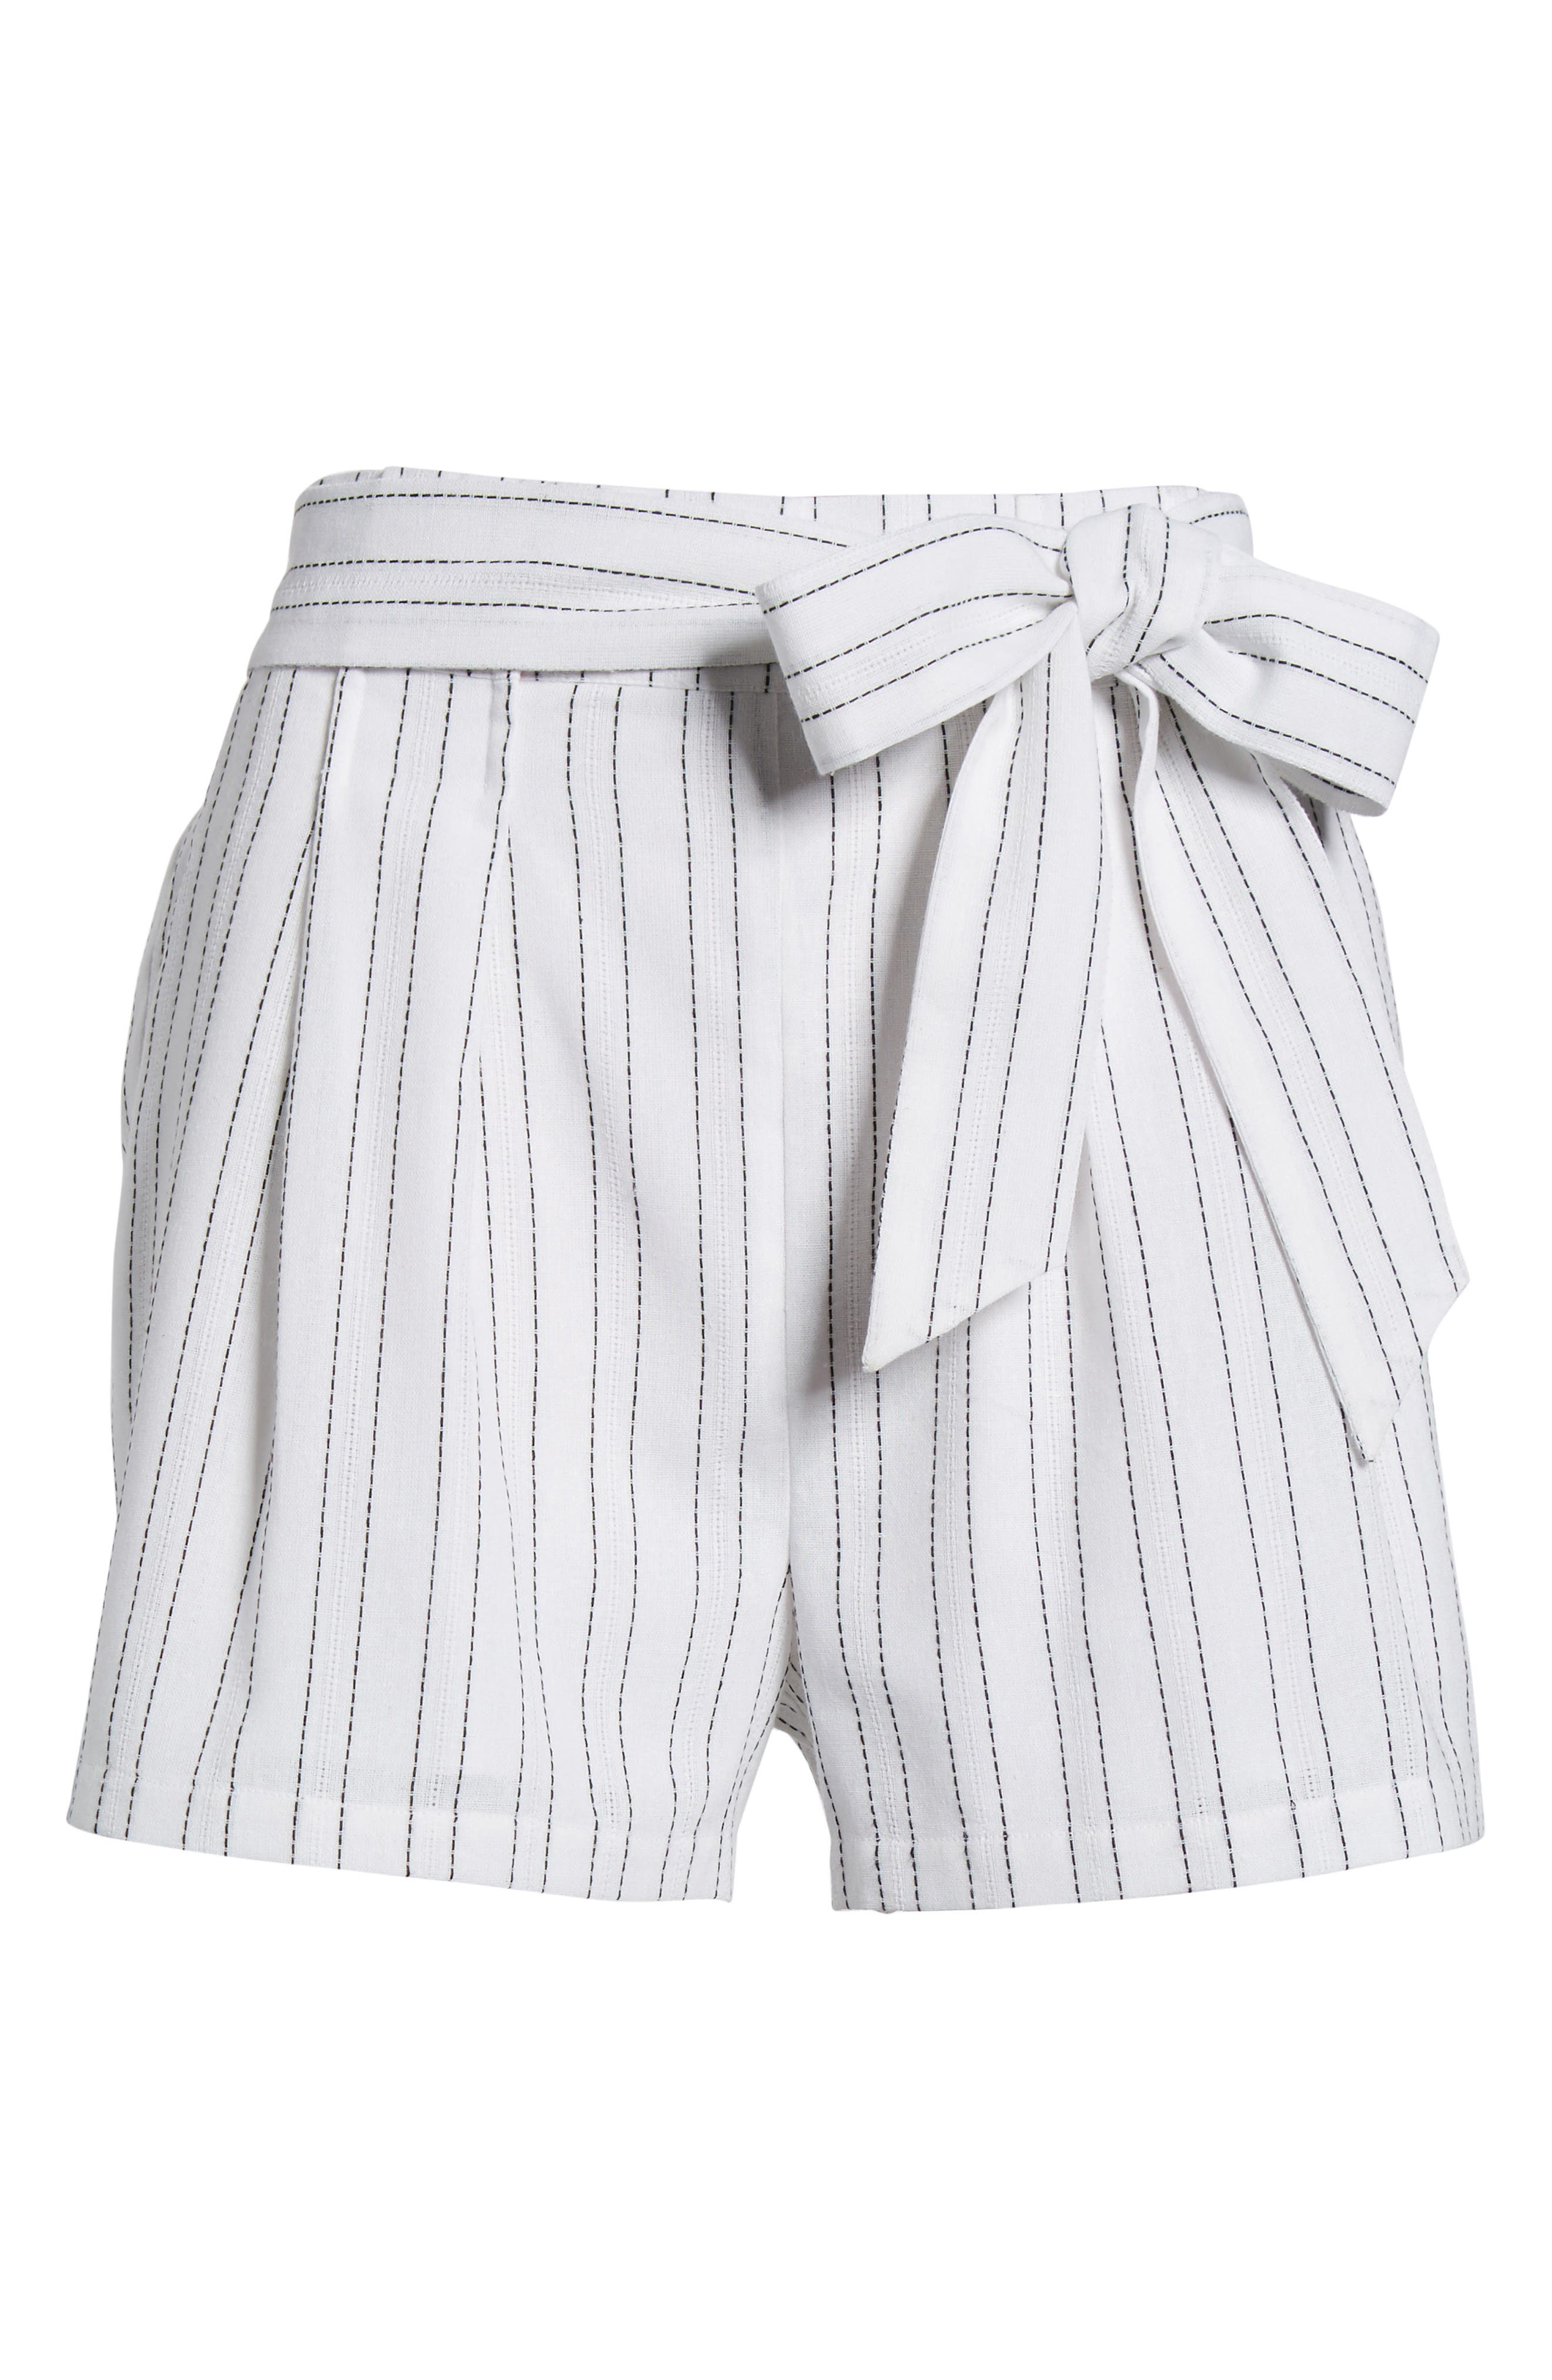 Tie Front Shorts,                             Alternate thumbnail 7, color,                             White/ Black